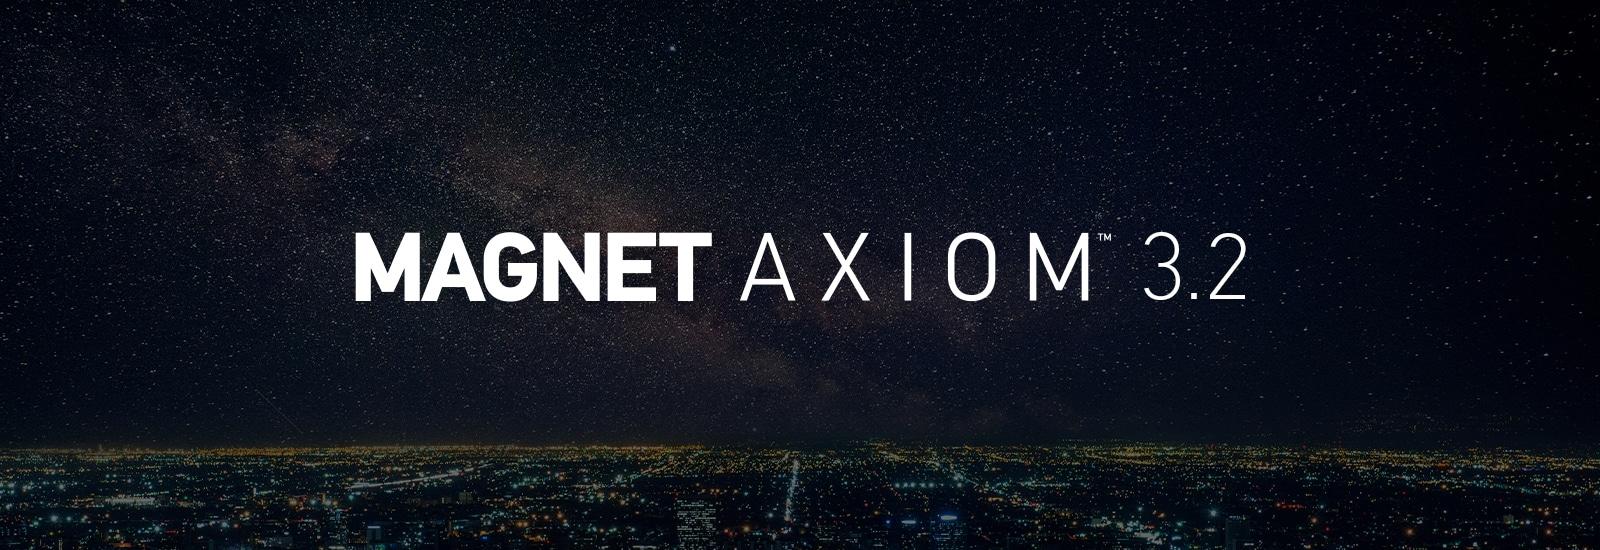 Magnet AXIOM 3.2